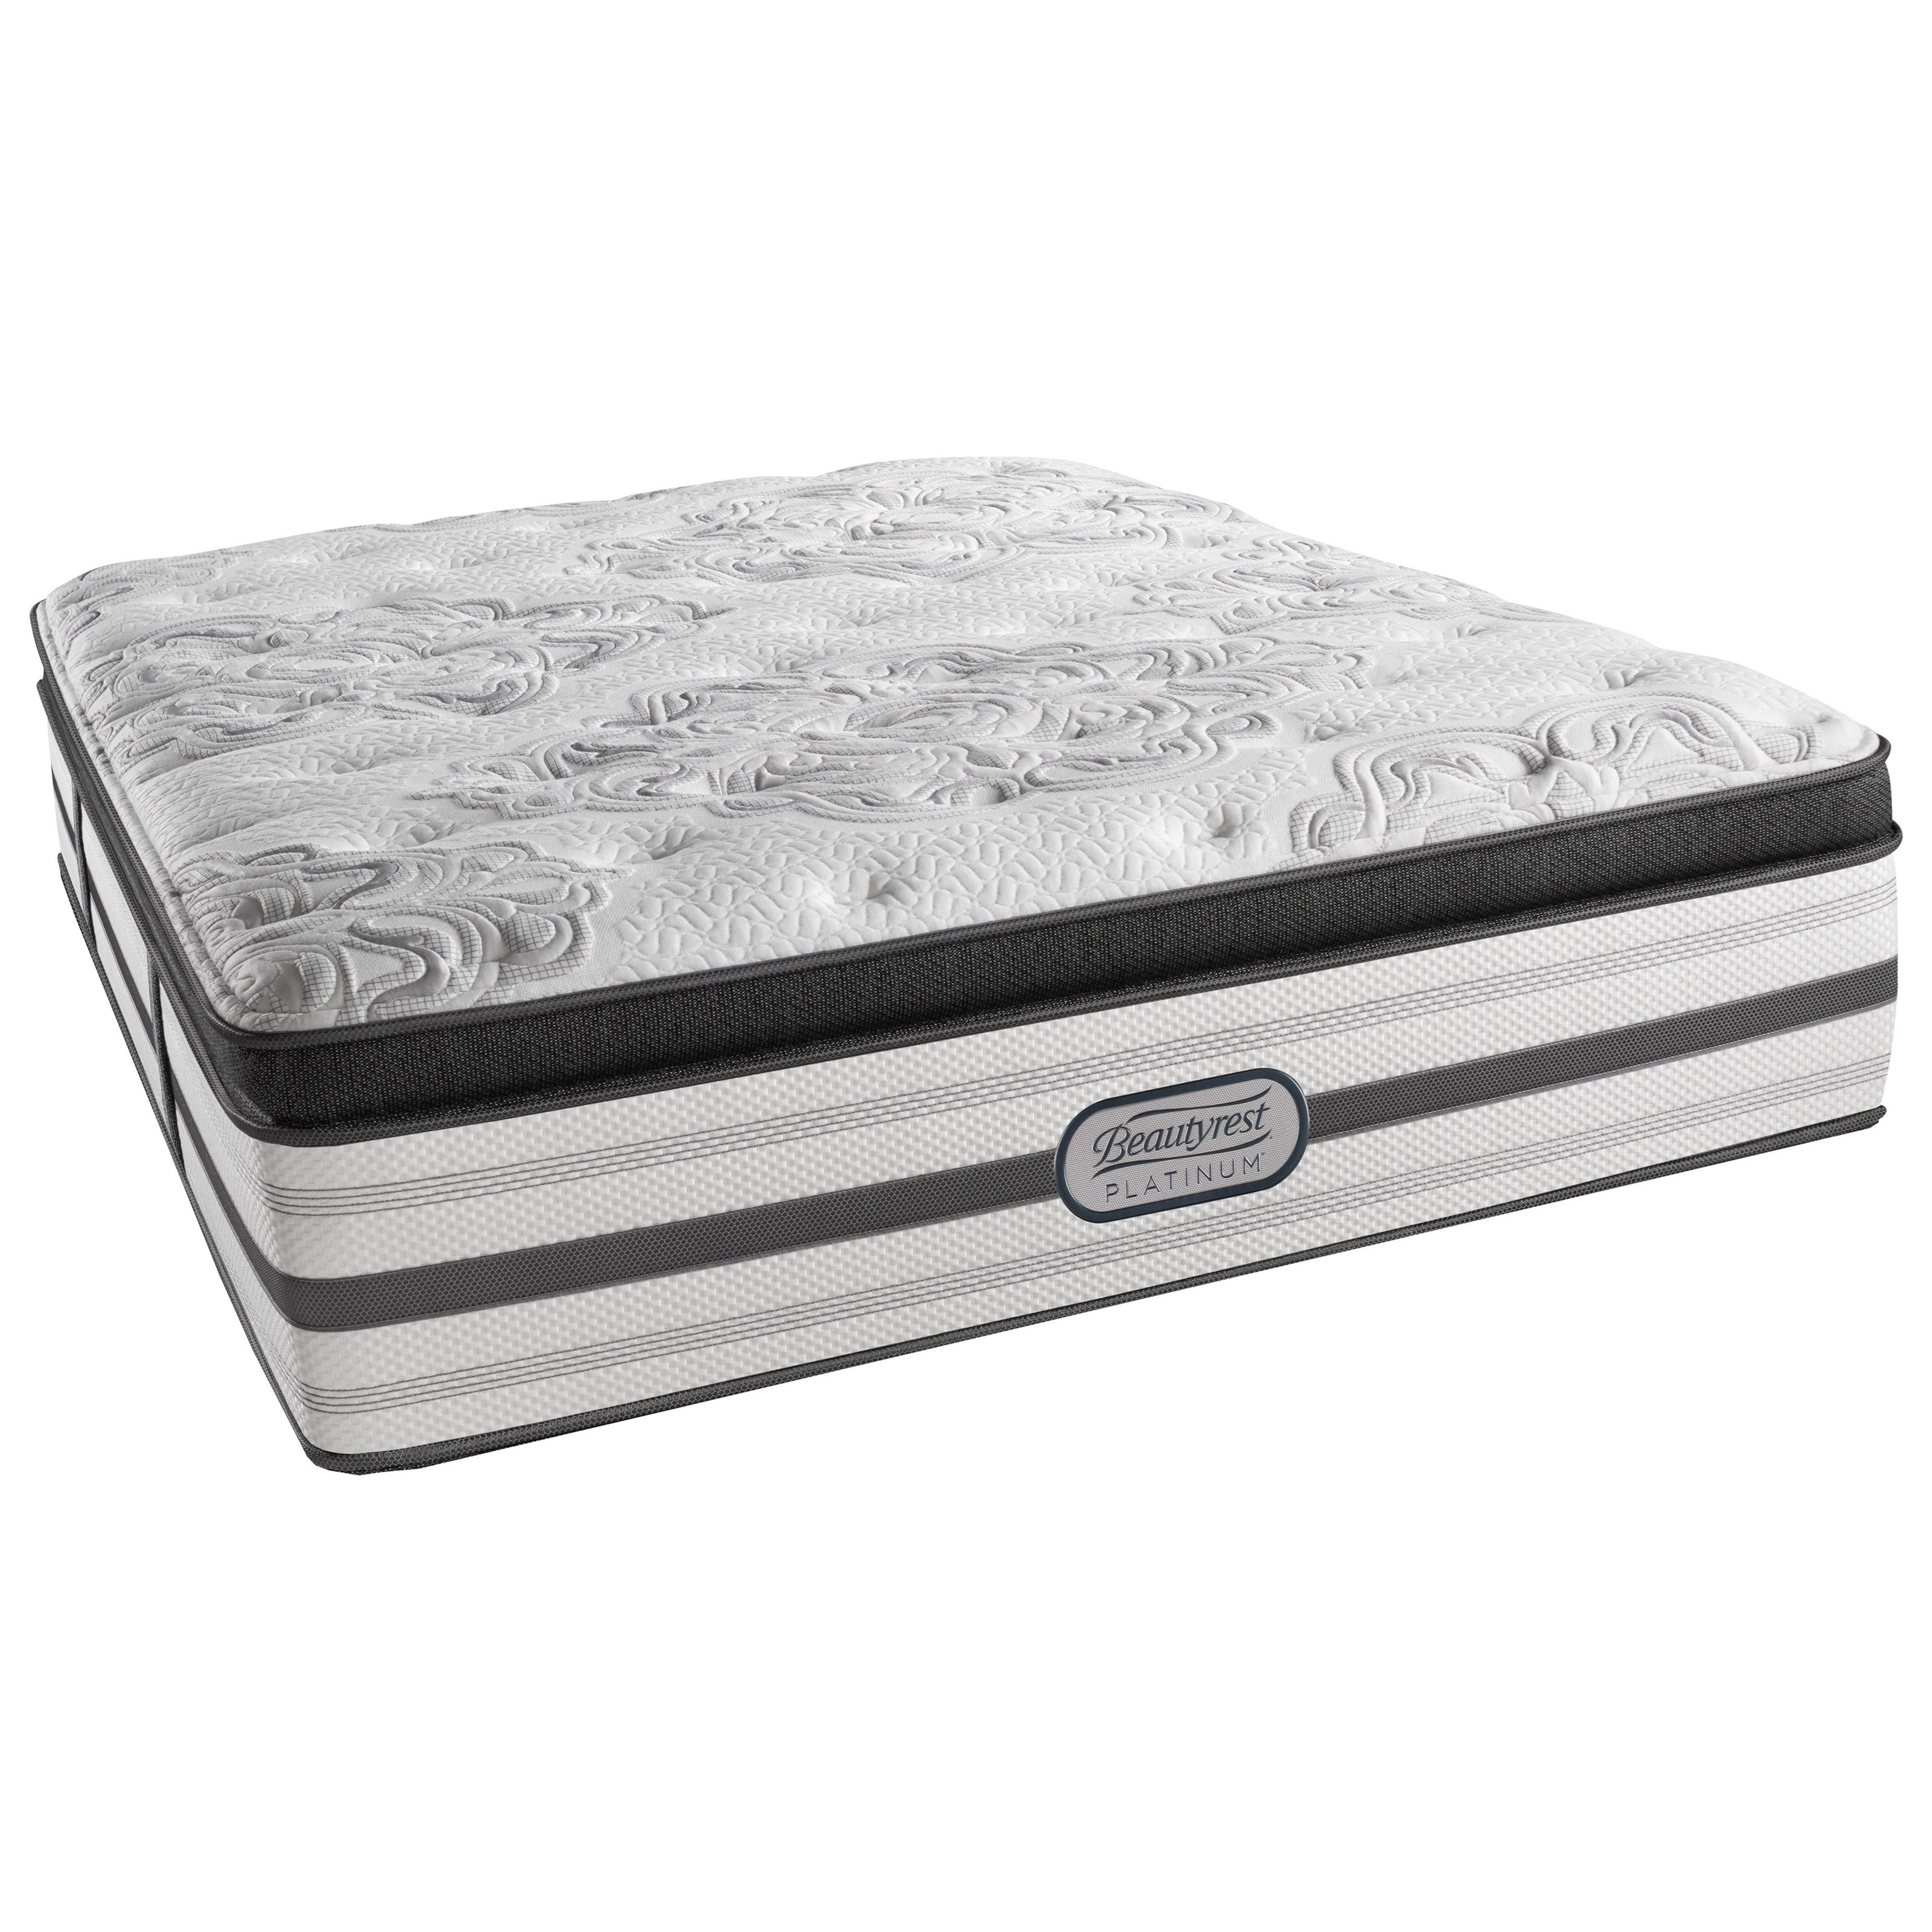 "Beautyrest Platinum Katherine Twin Luxury Firm Box PT 16 1/2"" Mattress - Item Number: LV4LFBT-T"